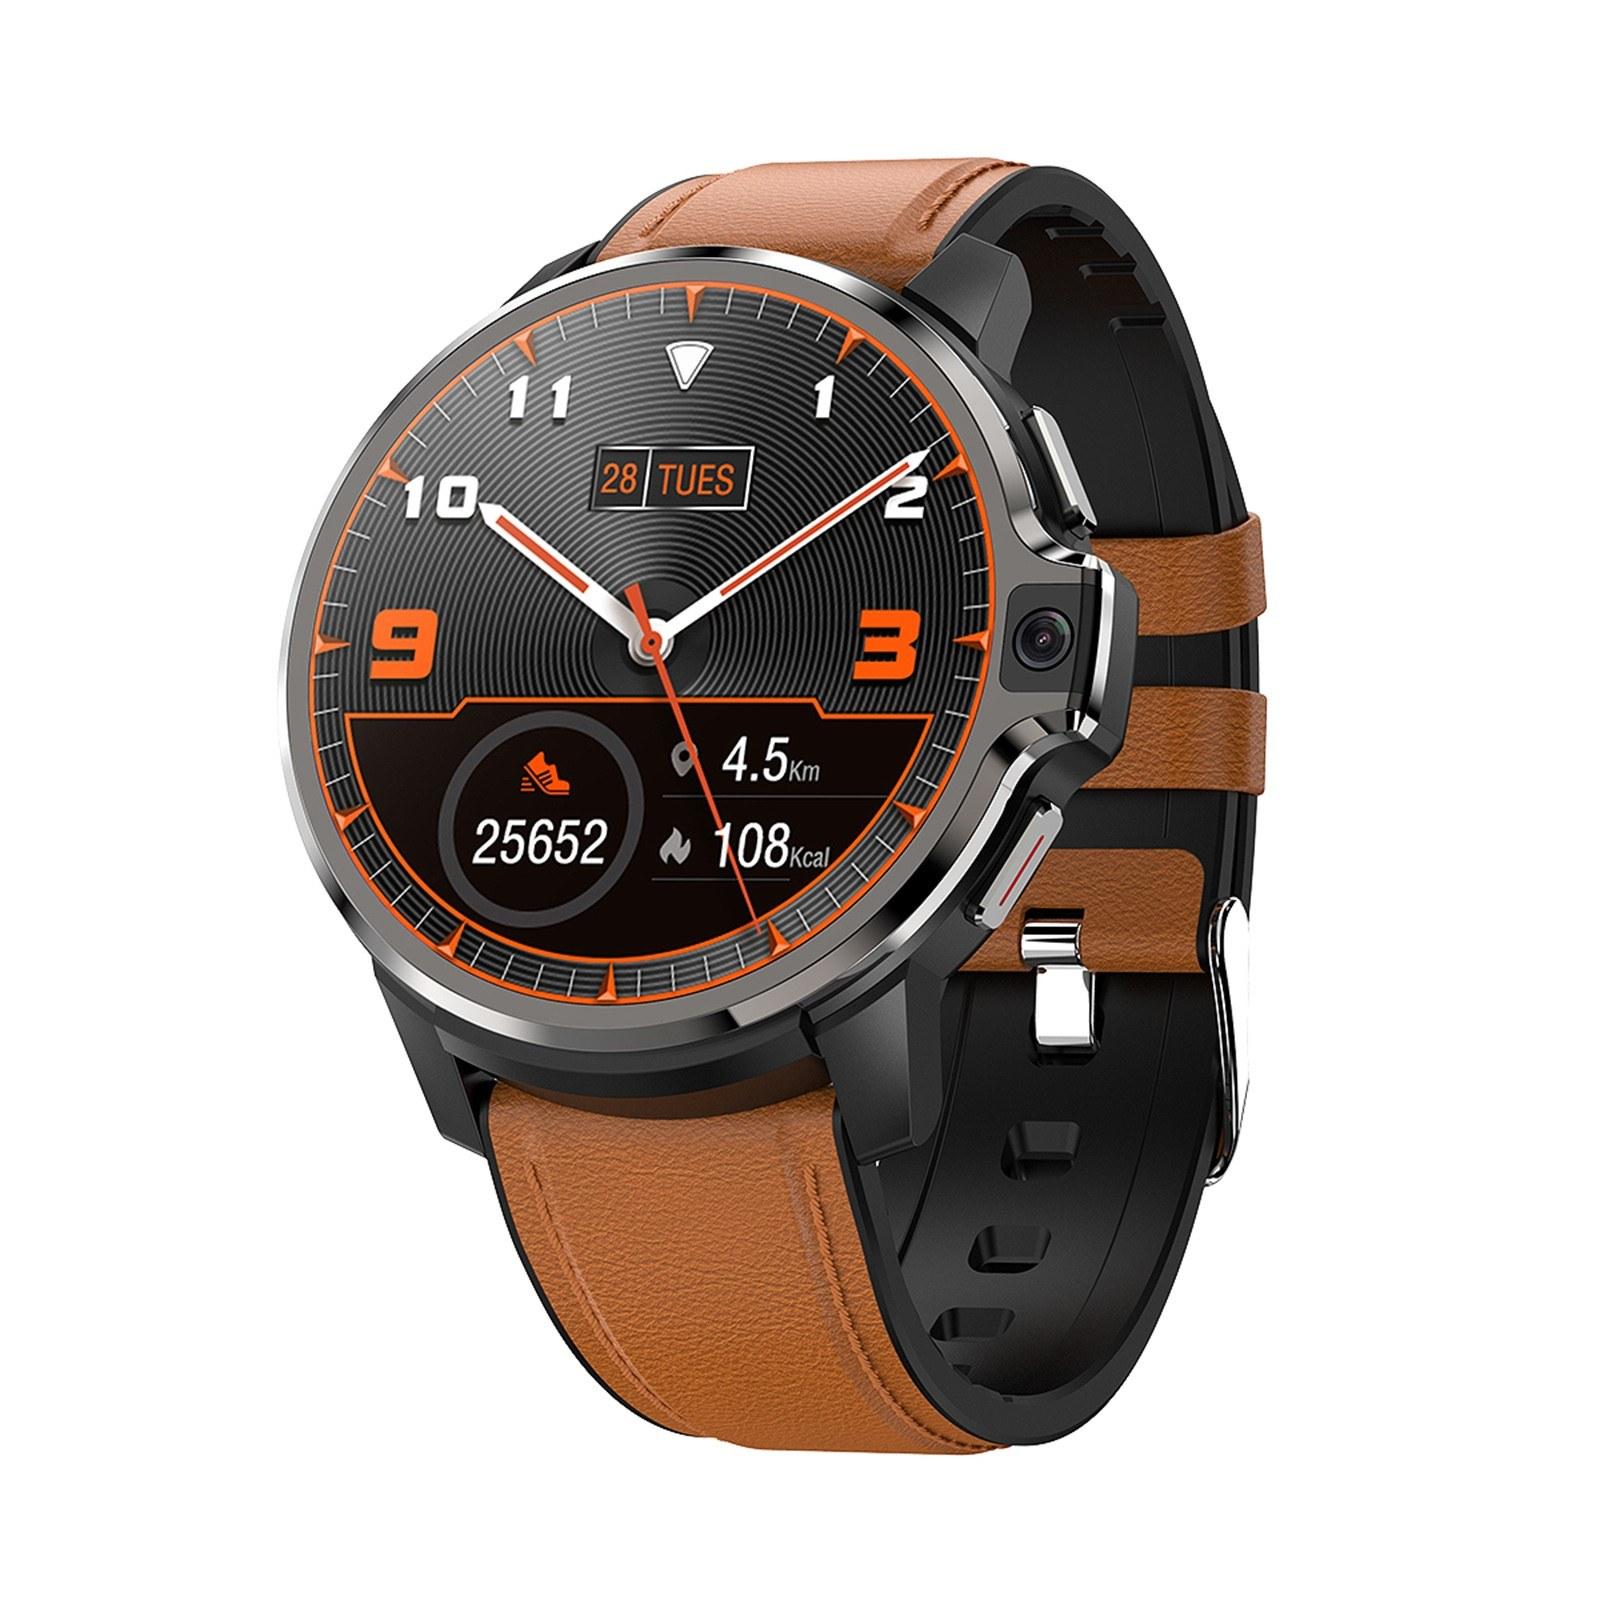 cafago.com - 32% OFF LEMFO LEMP 1.6-Inch IPS Full Circle Full-Touch Screen Smart Watch,free shipping+$217.54